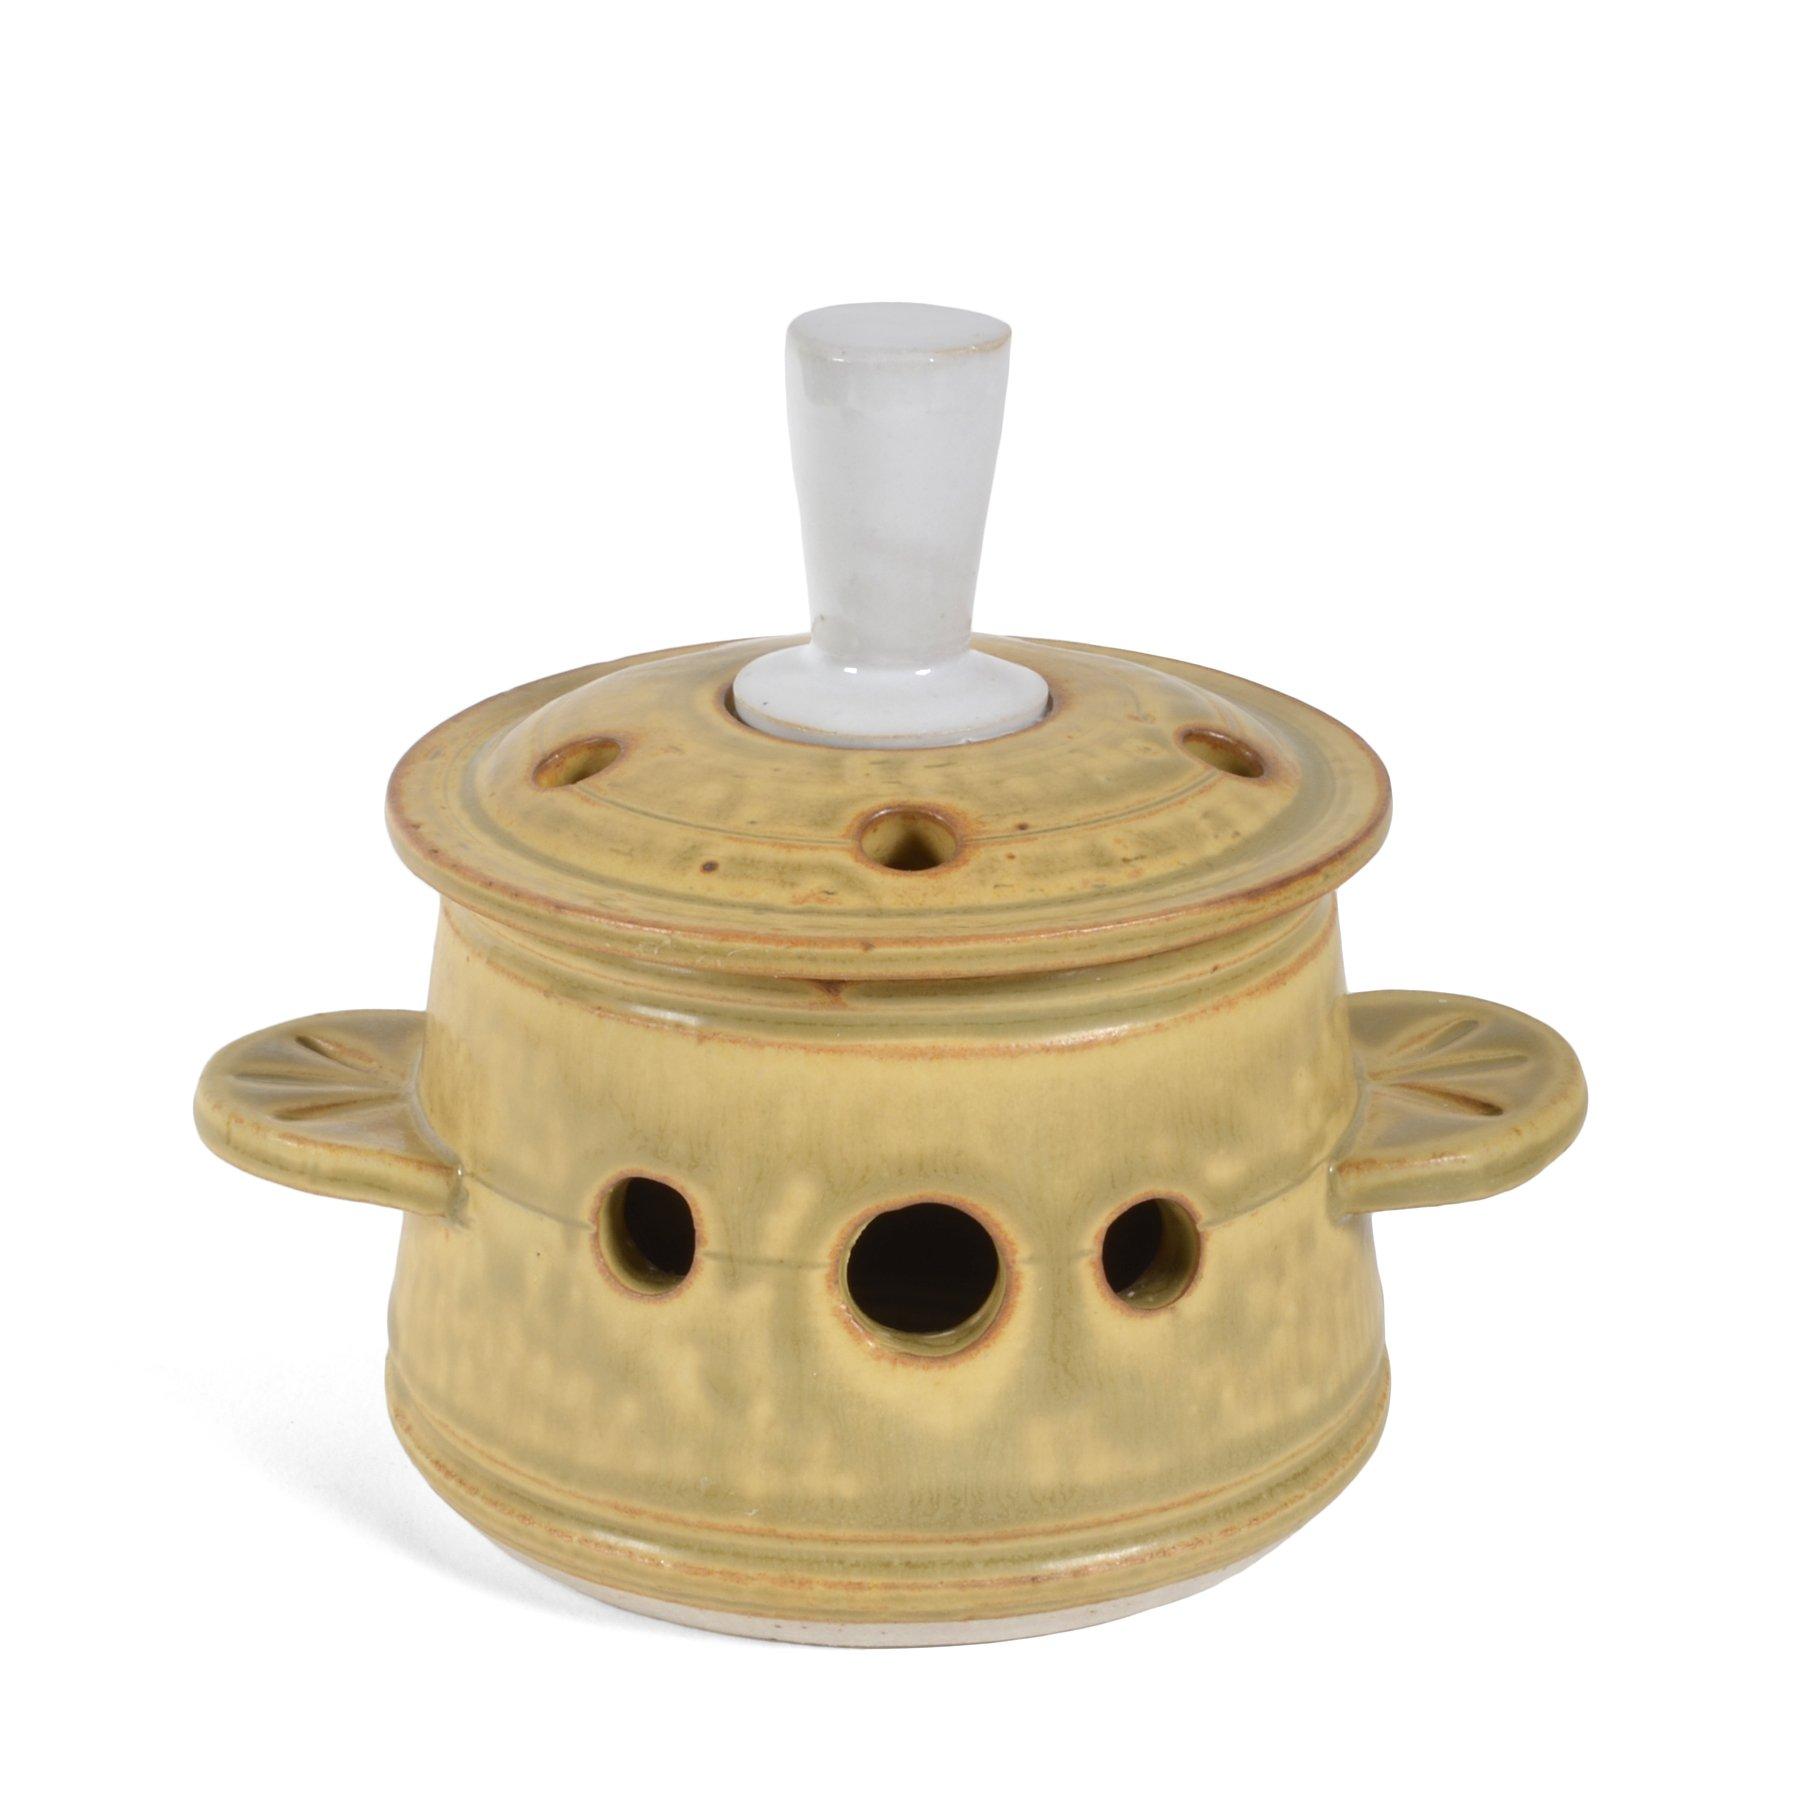 Dan Saultman Porcelain Pottery Garlic Keeper with Finial Lid, Wheat by Dan Saultman